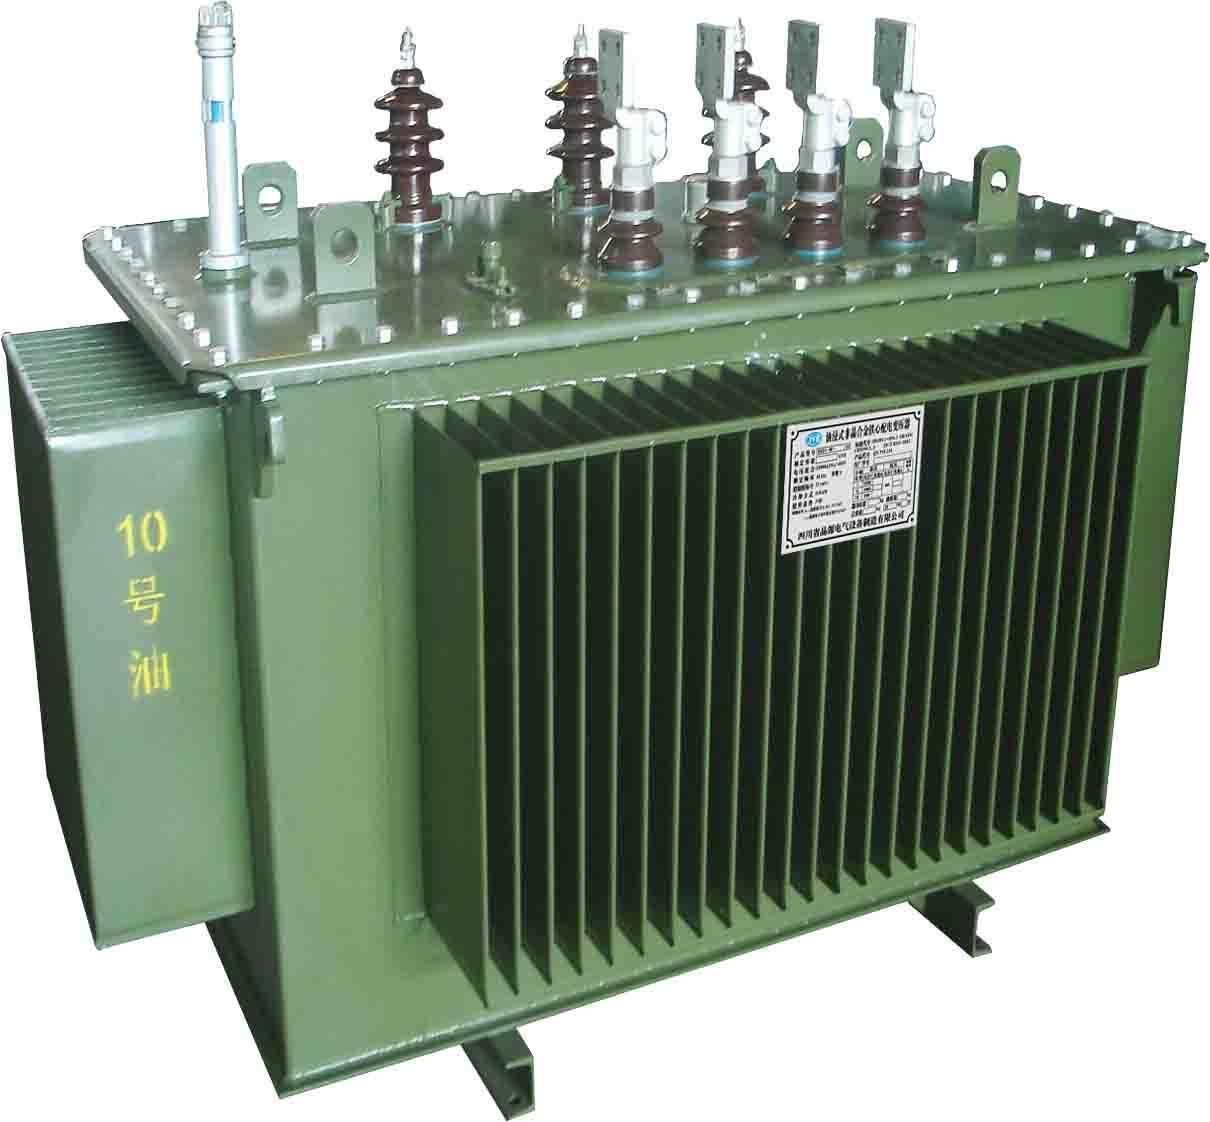 Supply Power/Distribution Transformer